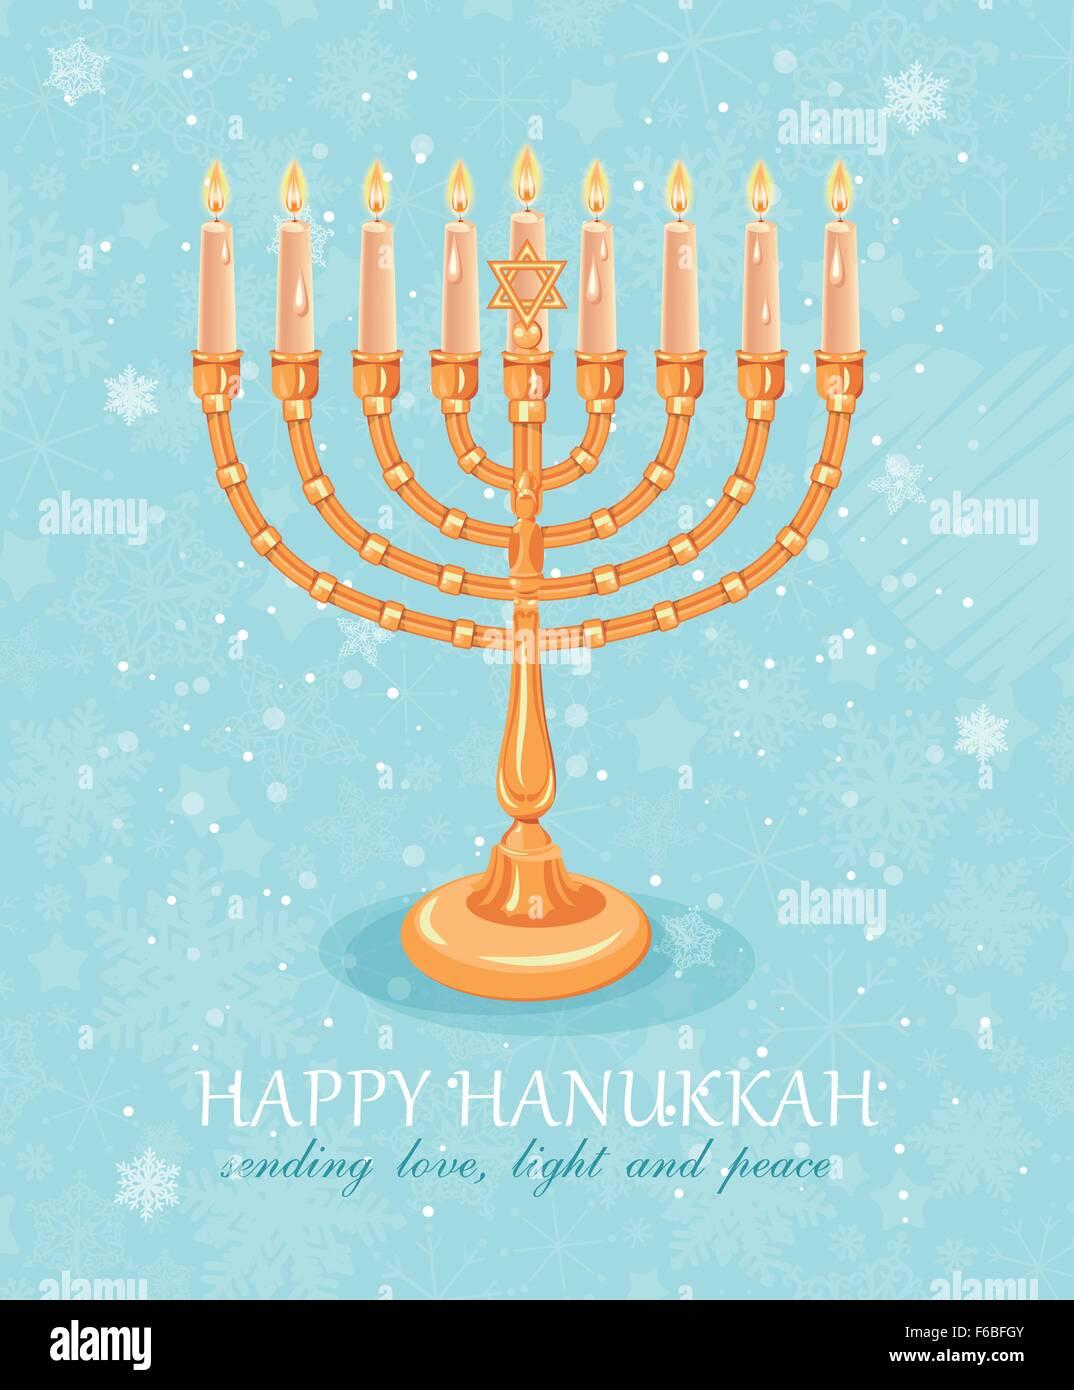 Happy Hanukkah greeting card design, jewish holiday. Vector illustration - Stock Vector